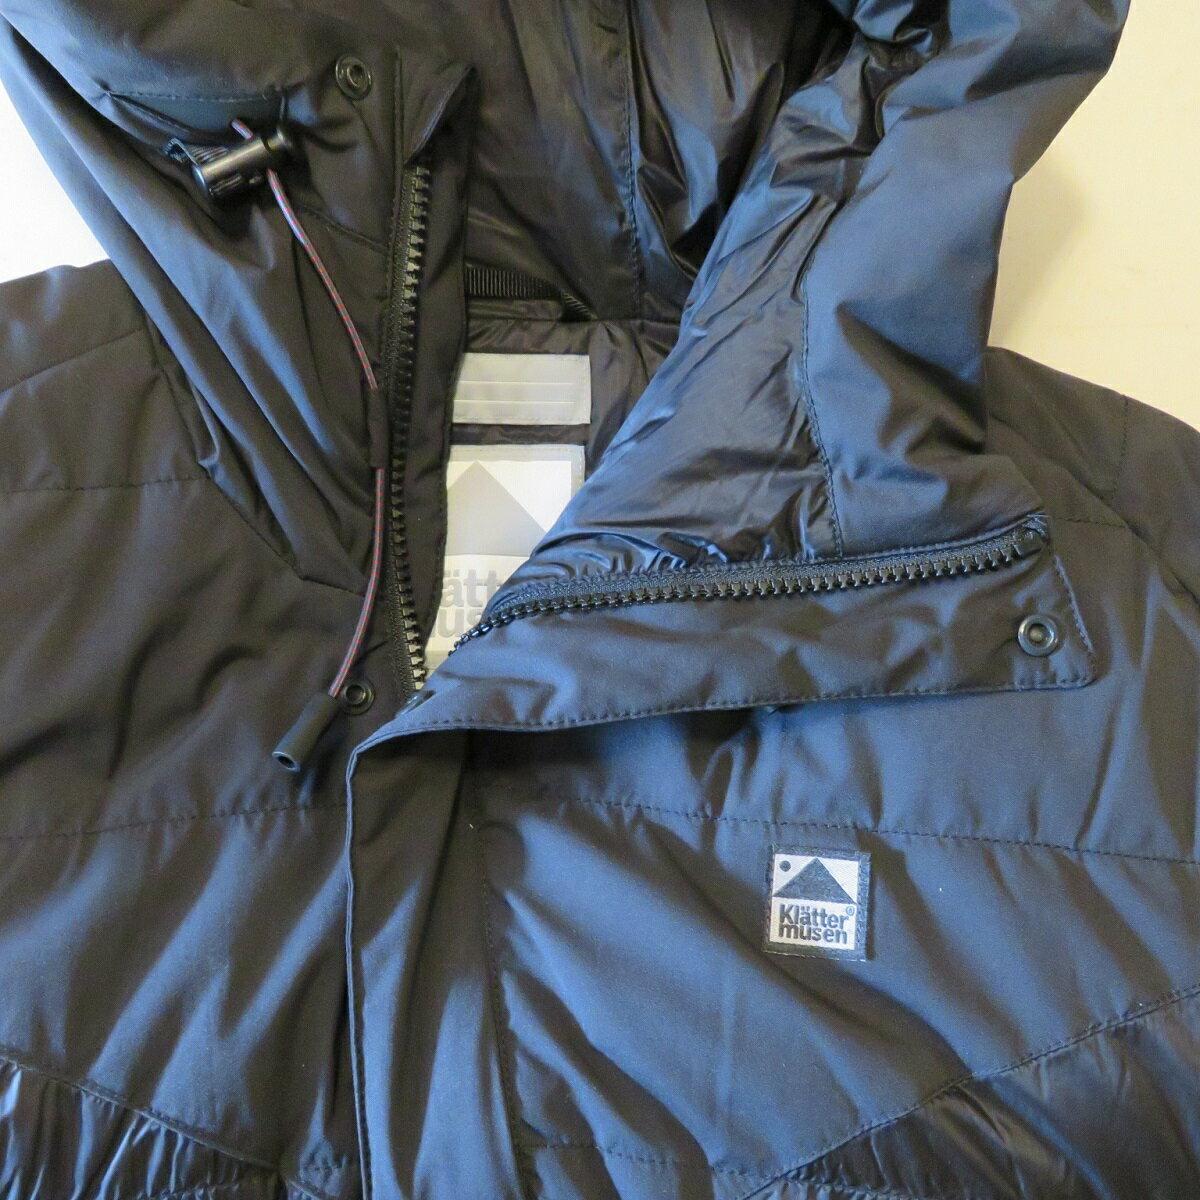 KLATTERMUSEN(クレッタルムーセン) Atle2.0 Jacket M's Raven Mサイズ